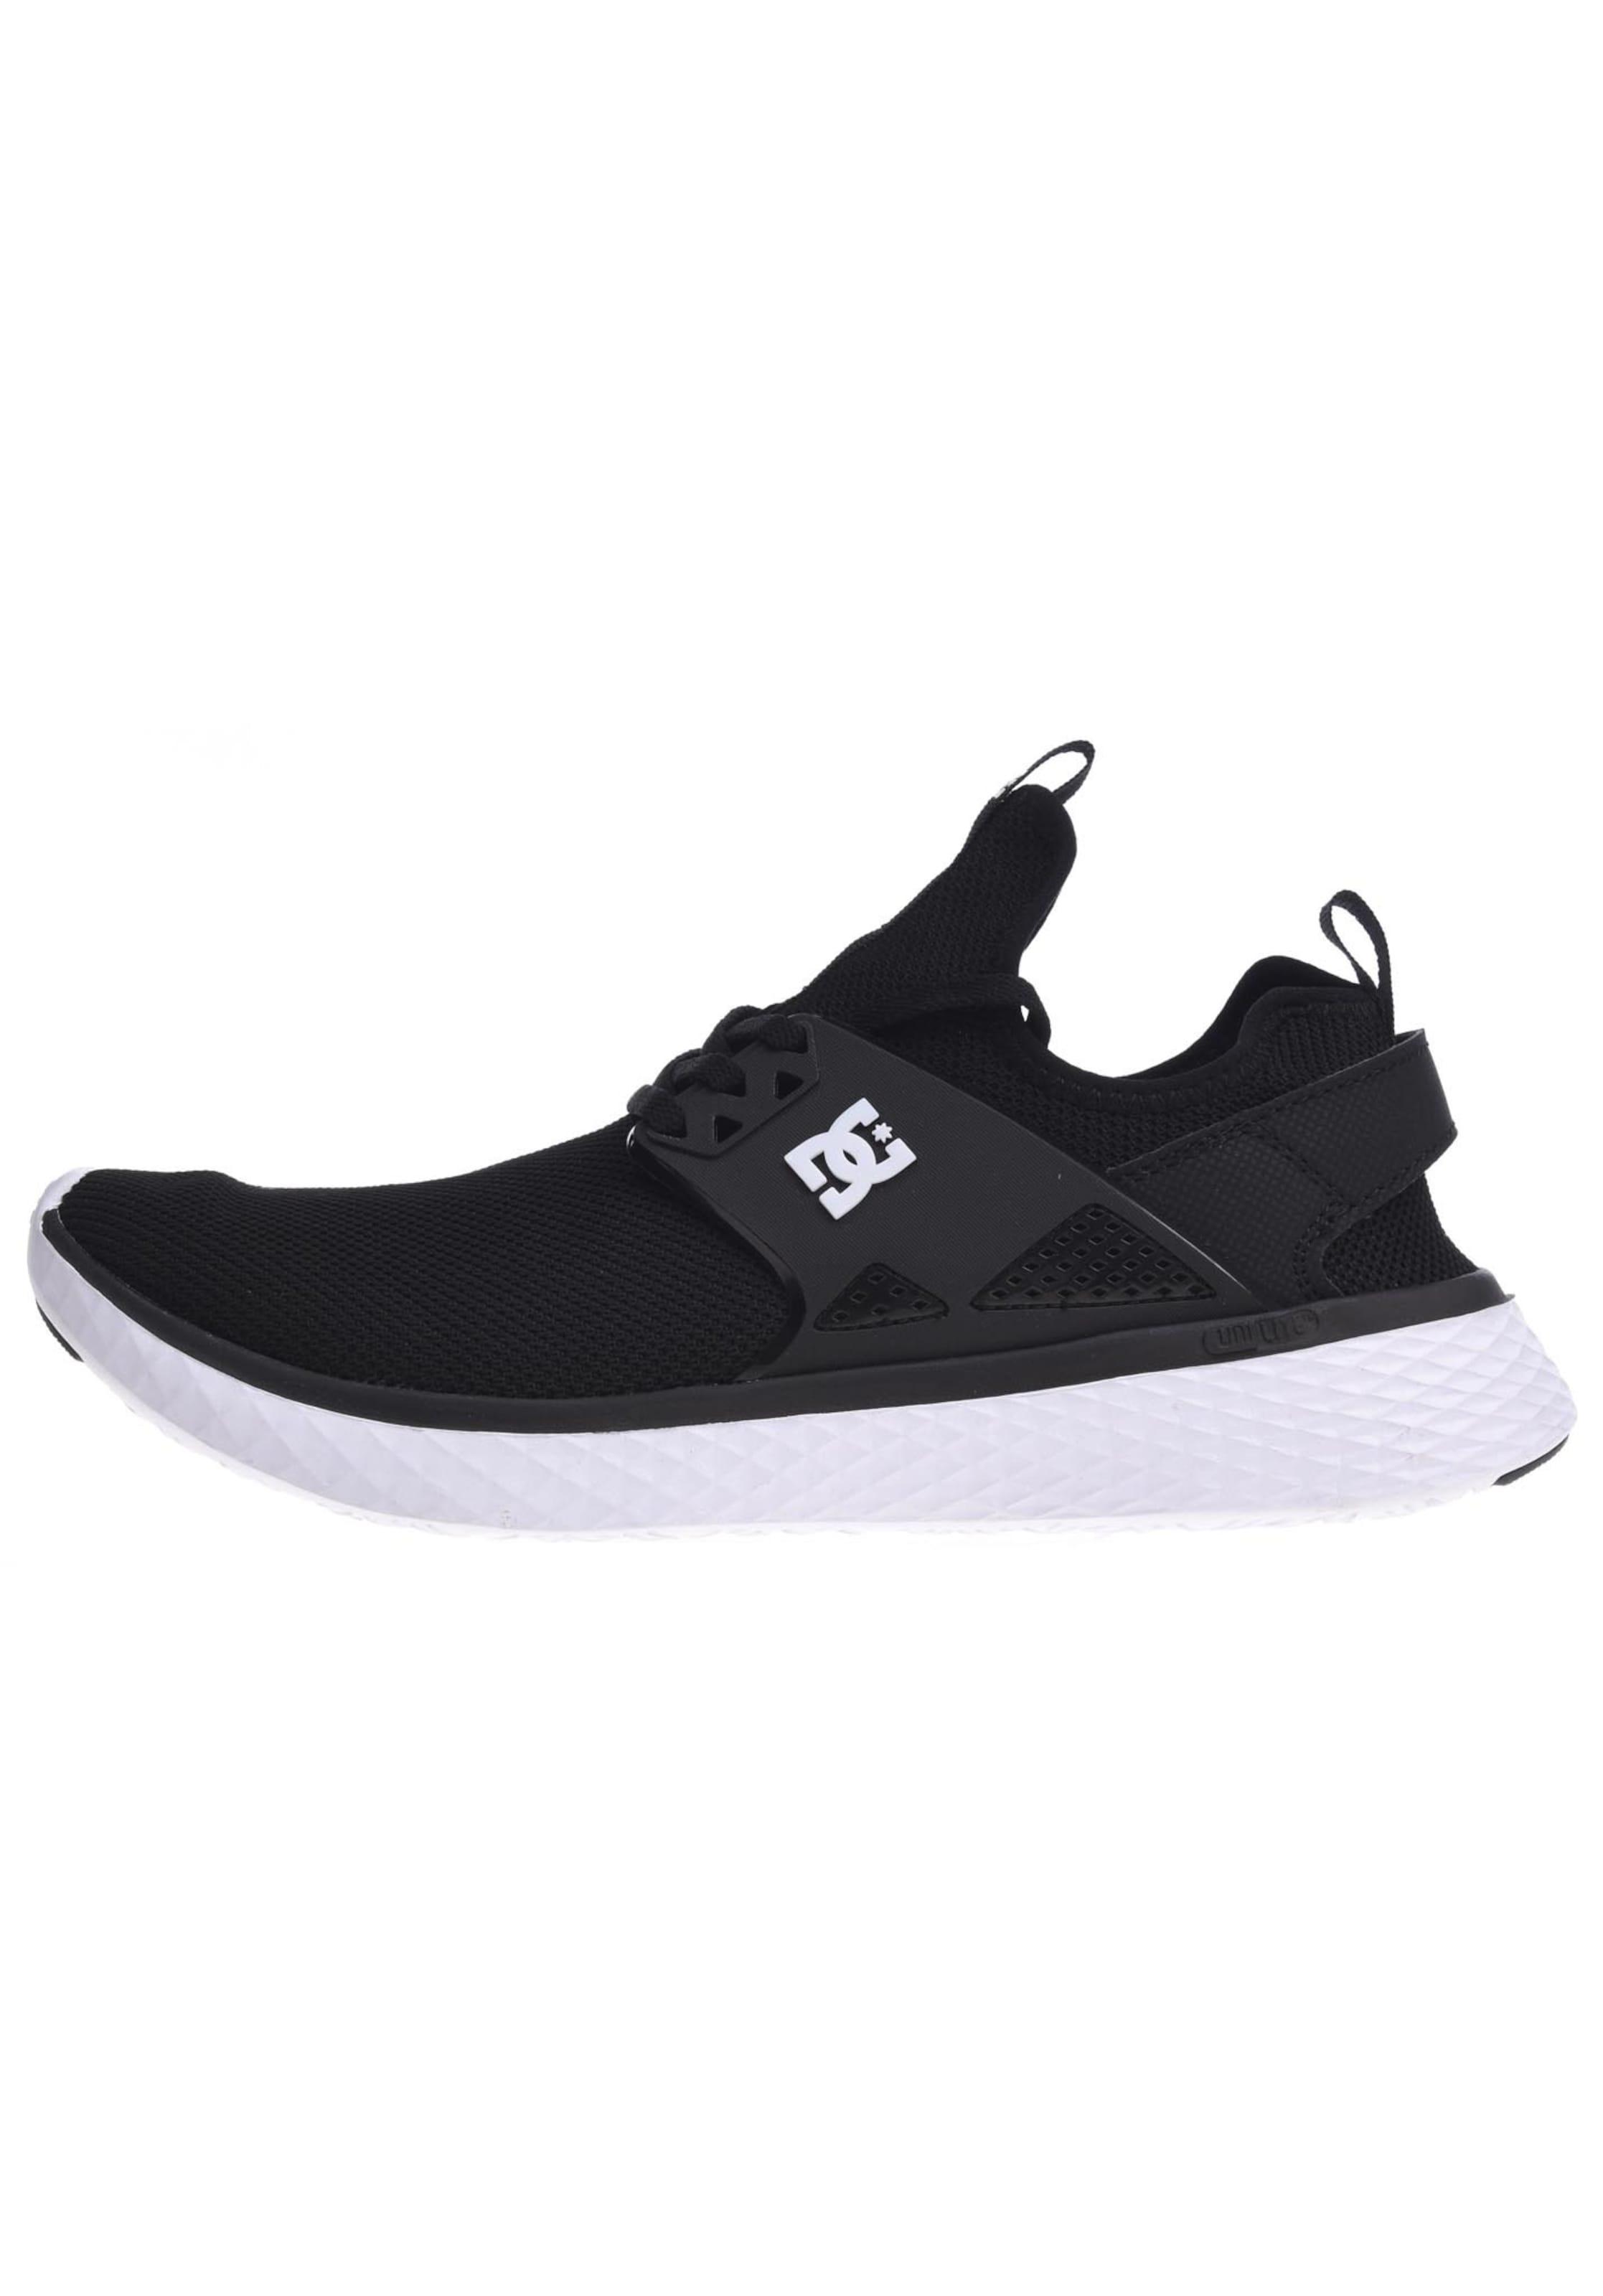 DC Shoes | Turnschuhe Meridian